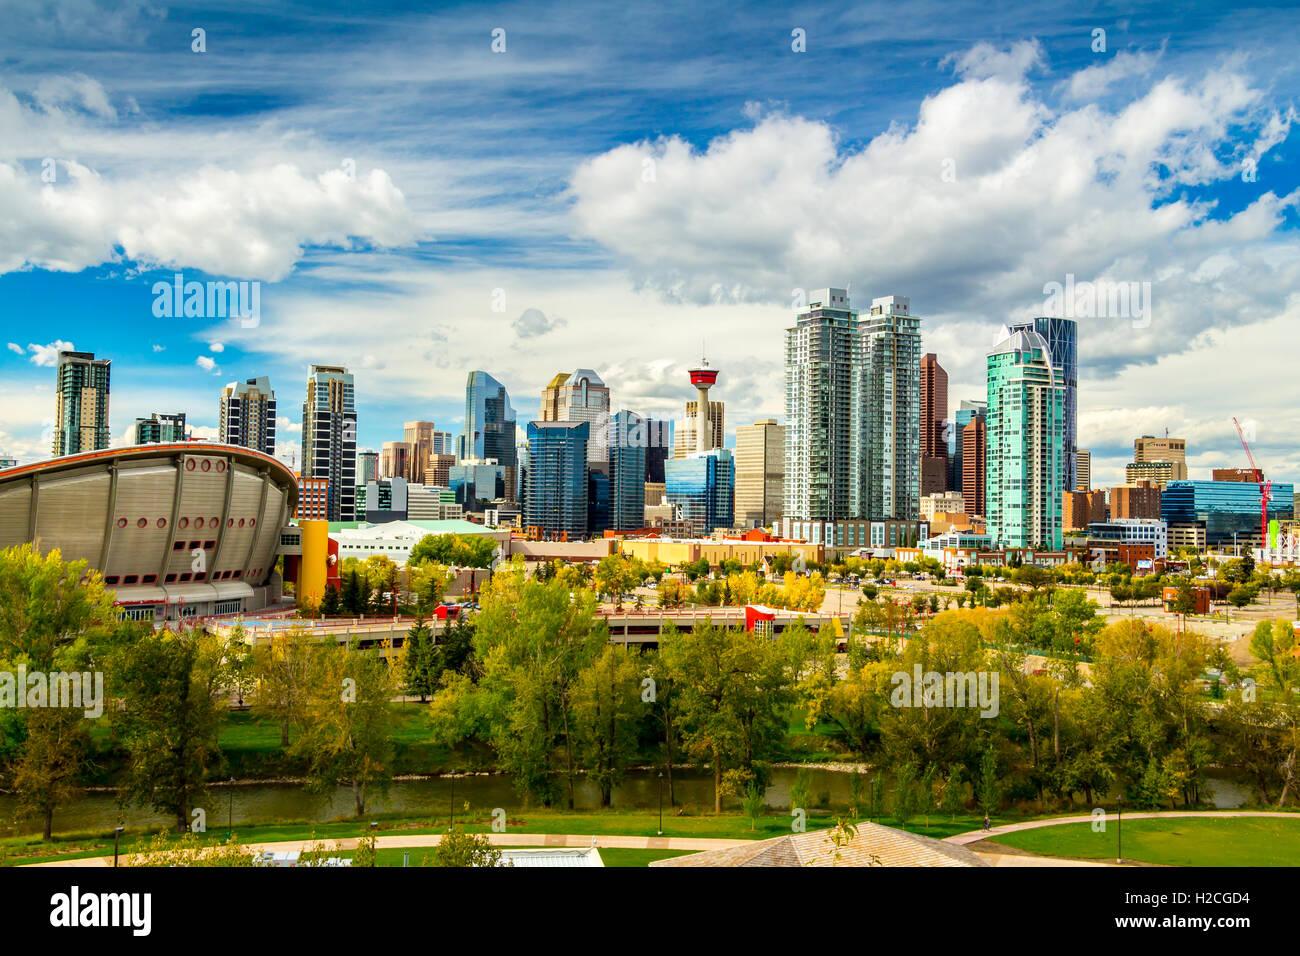 Skyline von Calgary Herbst Saison Stockbild